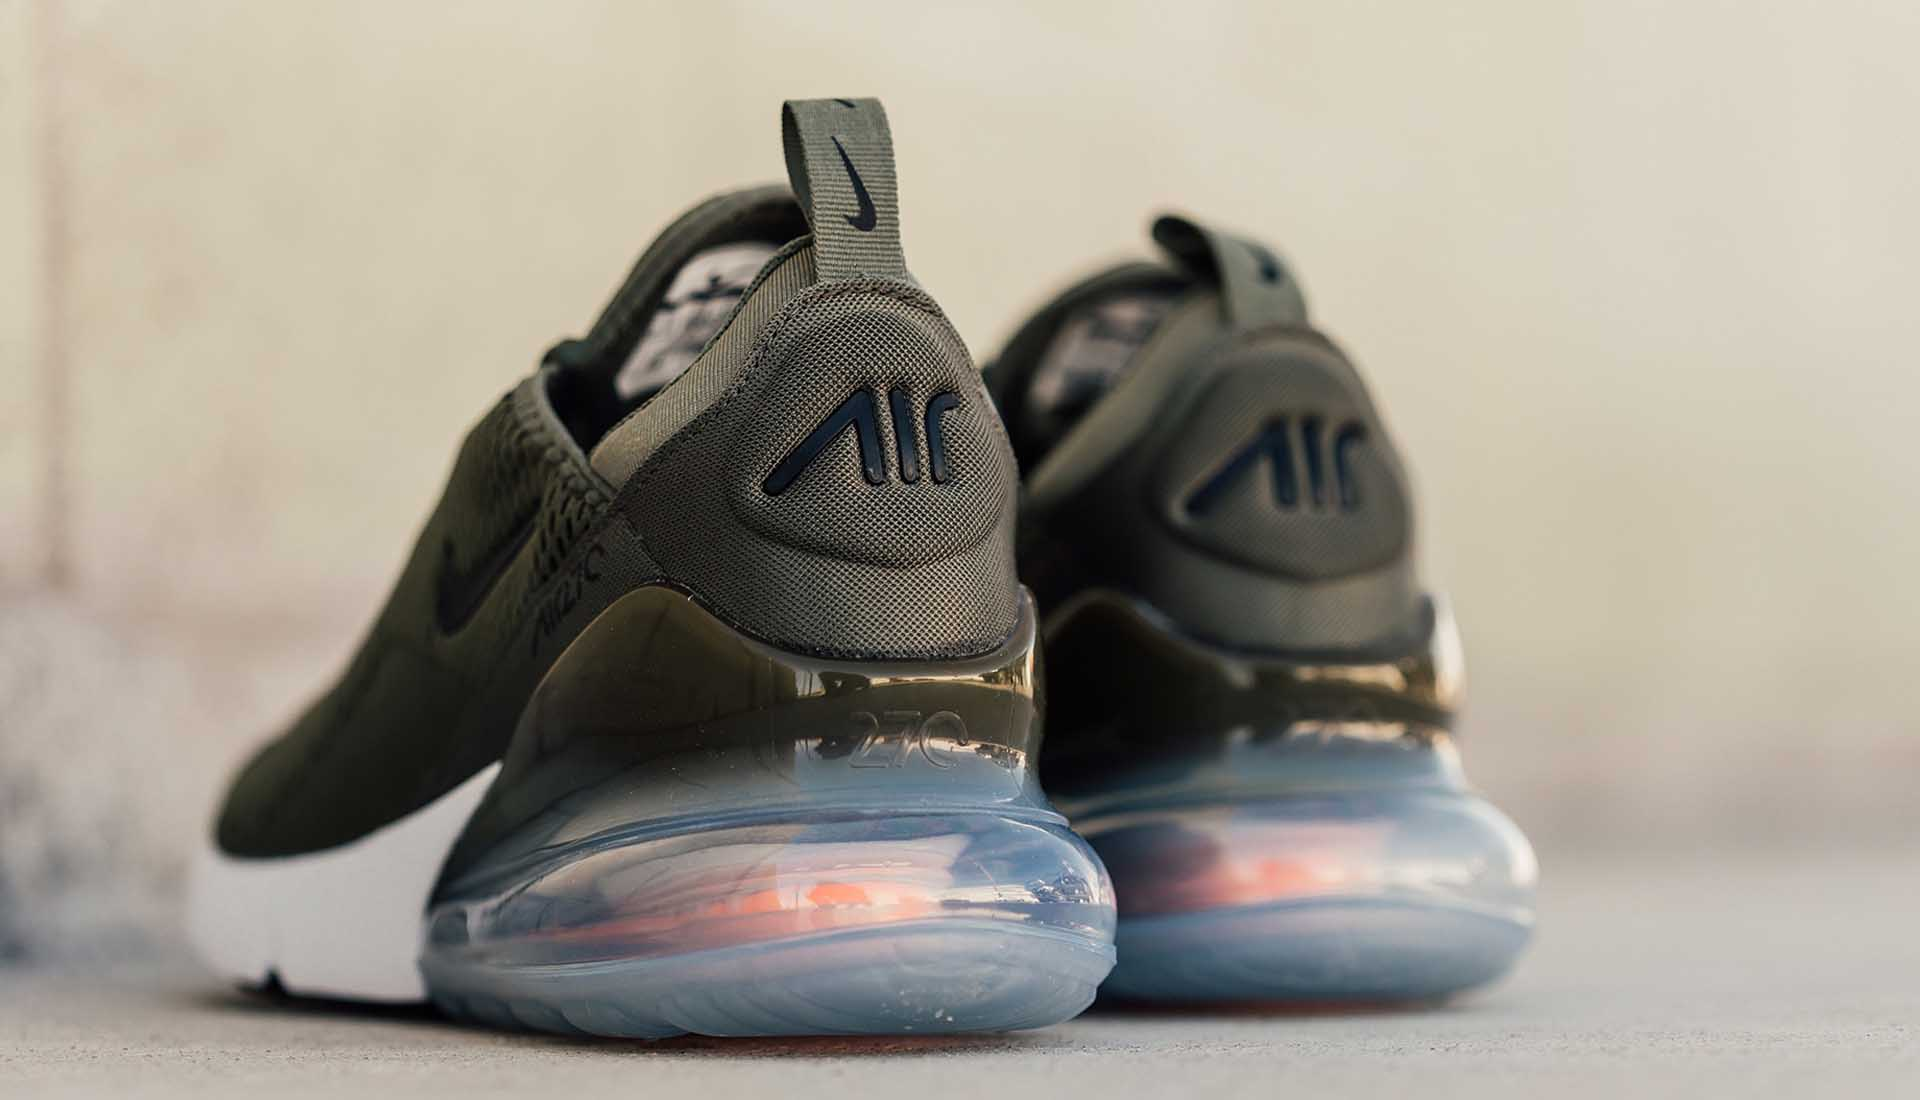 5a01e2e7d3e8 Nike Air Max 270 Sneakers